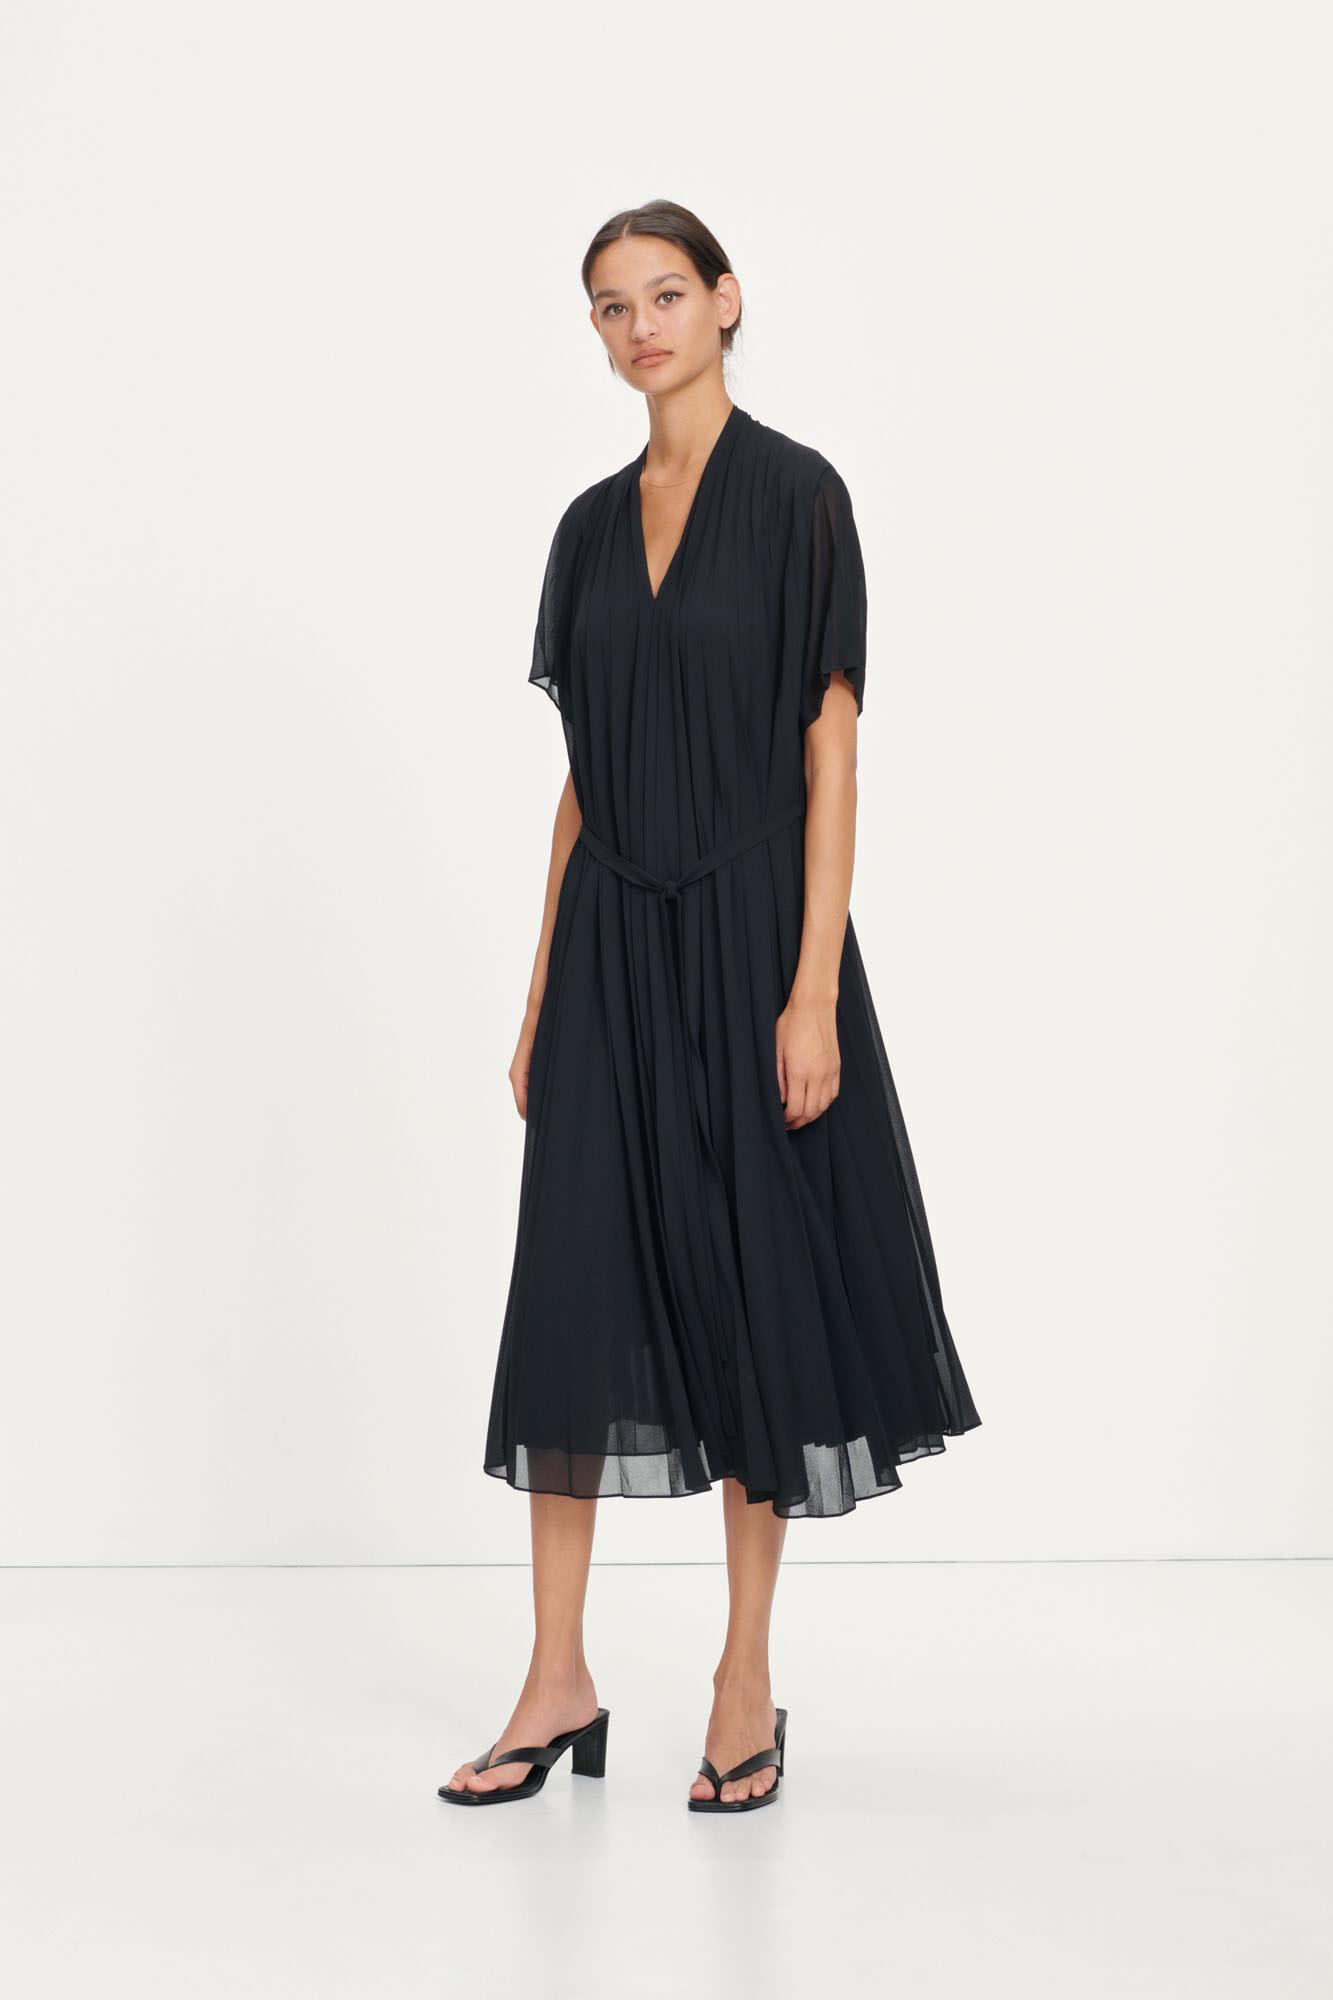 Wala Short Sleeve Pleaded Dress Black-2